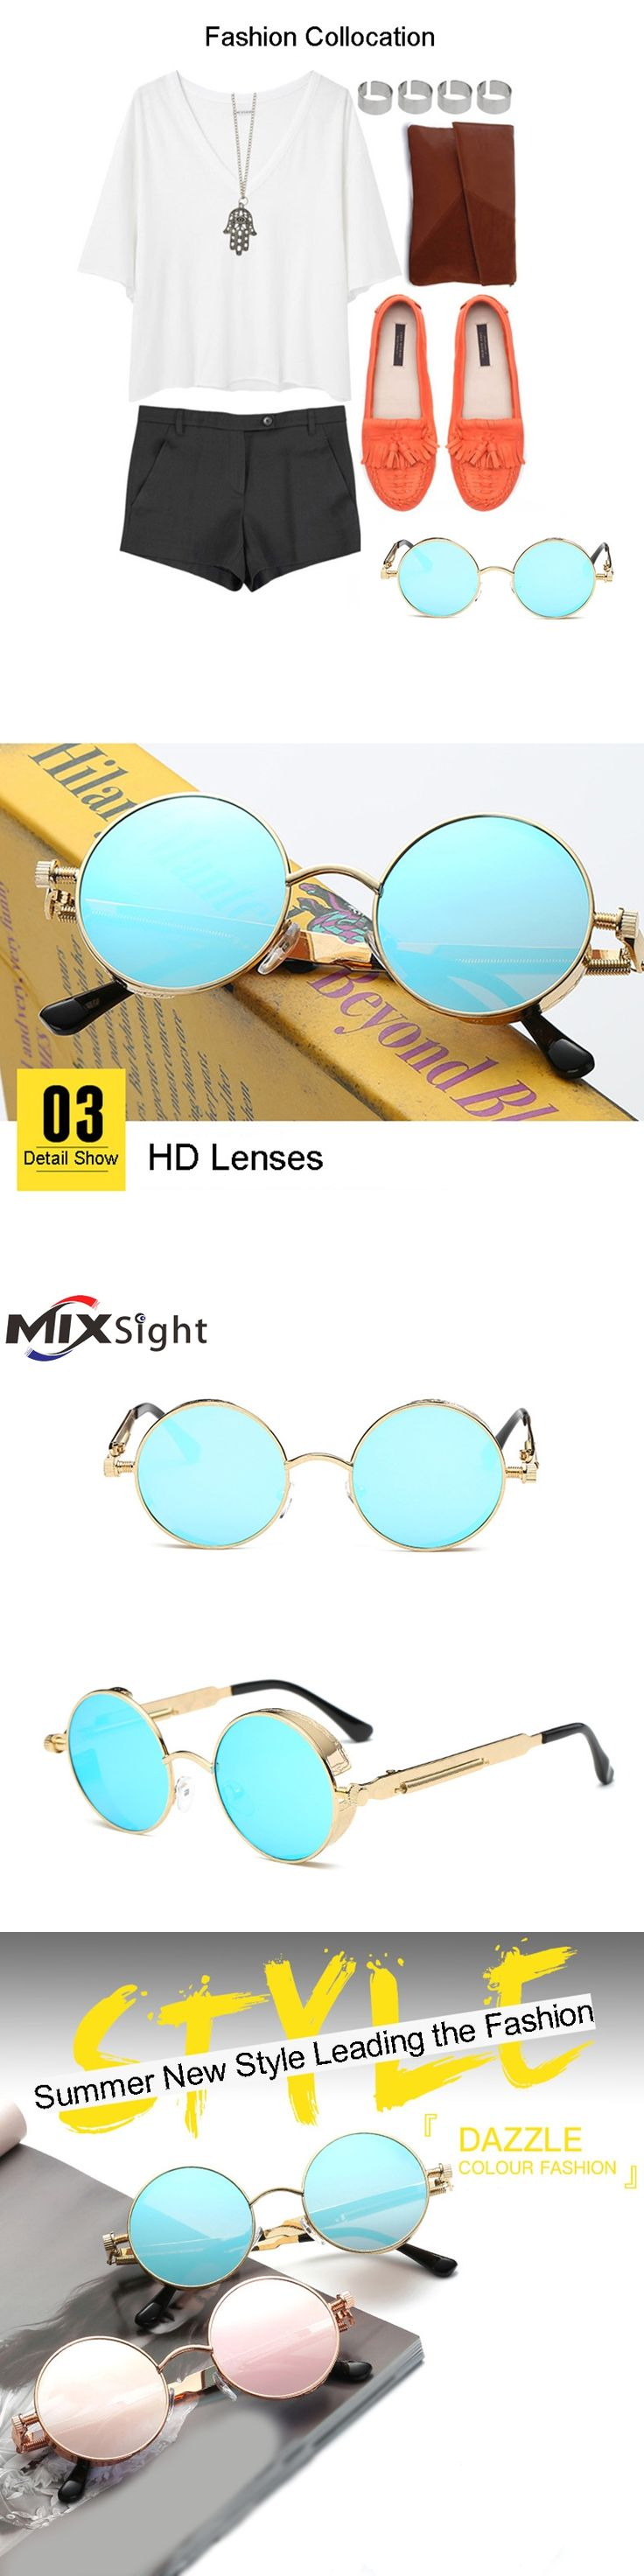 Round Metal Cycling Eyewear Protective Antifog Glasses For Work Men Safety Welding Glasses Brand Designer Retro Vintage UV400